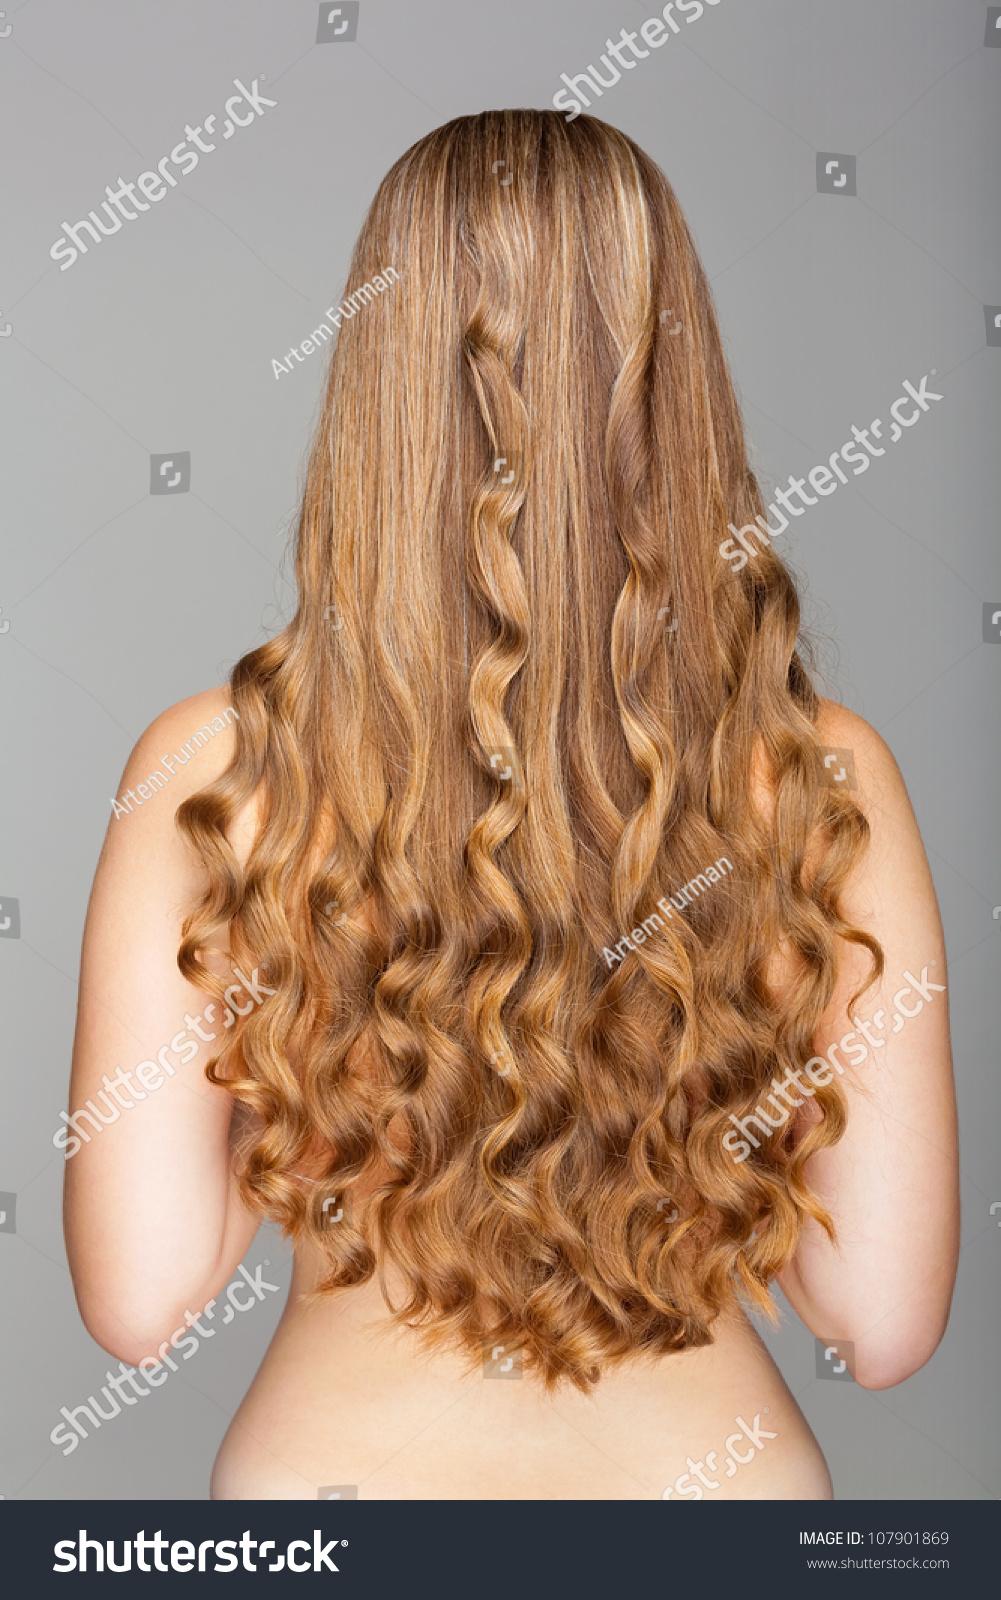 beautiful long wavy hair back view stock photo 107901869